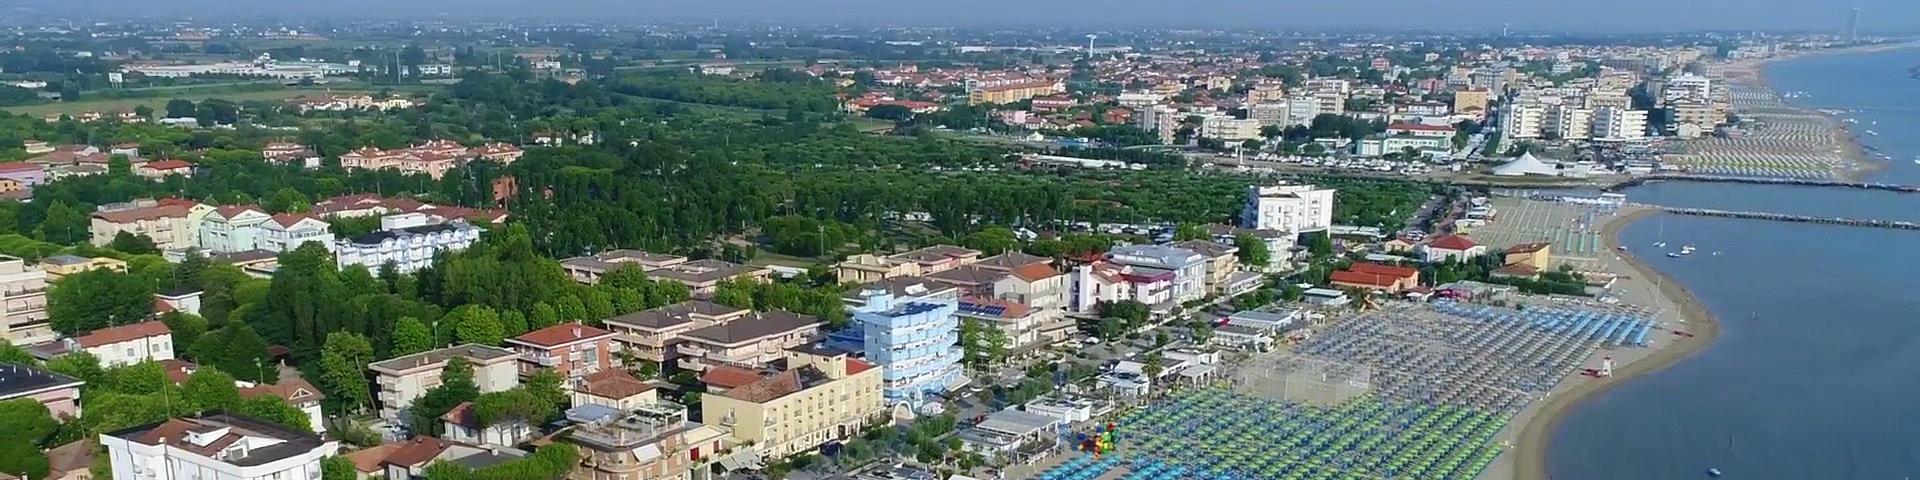 San Mauro Mare